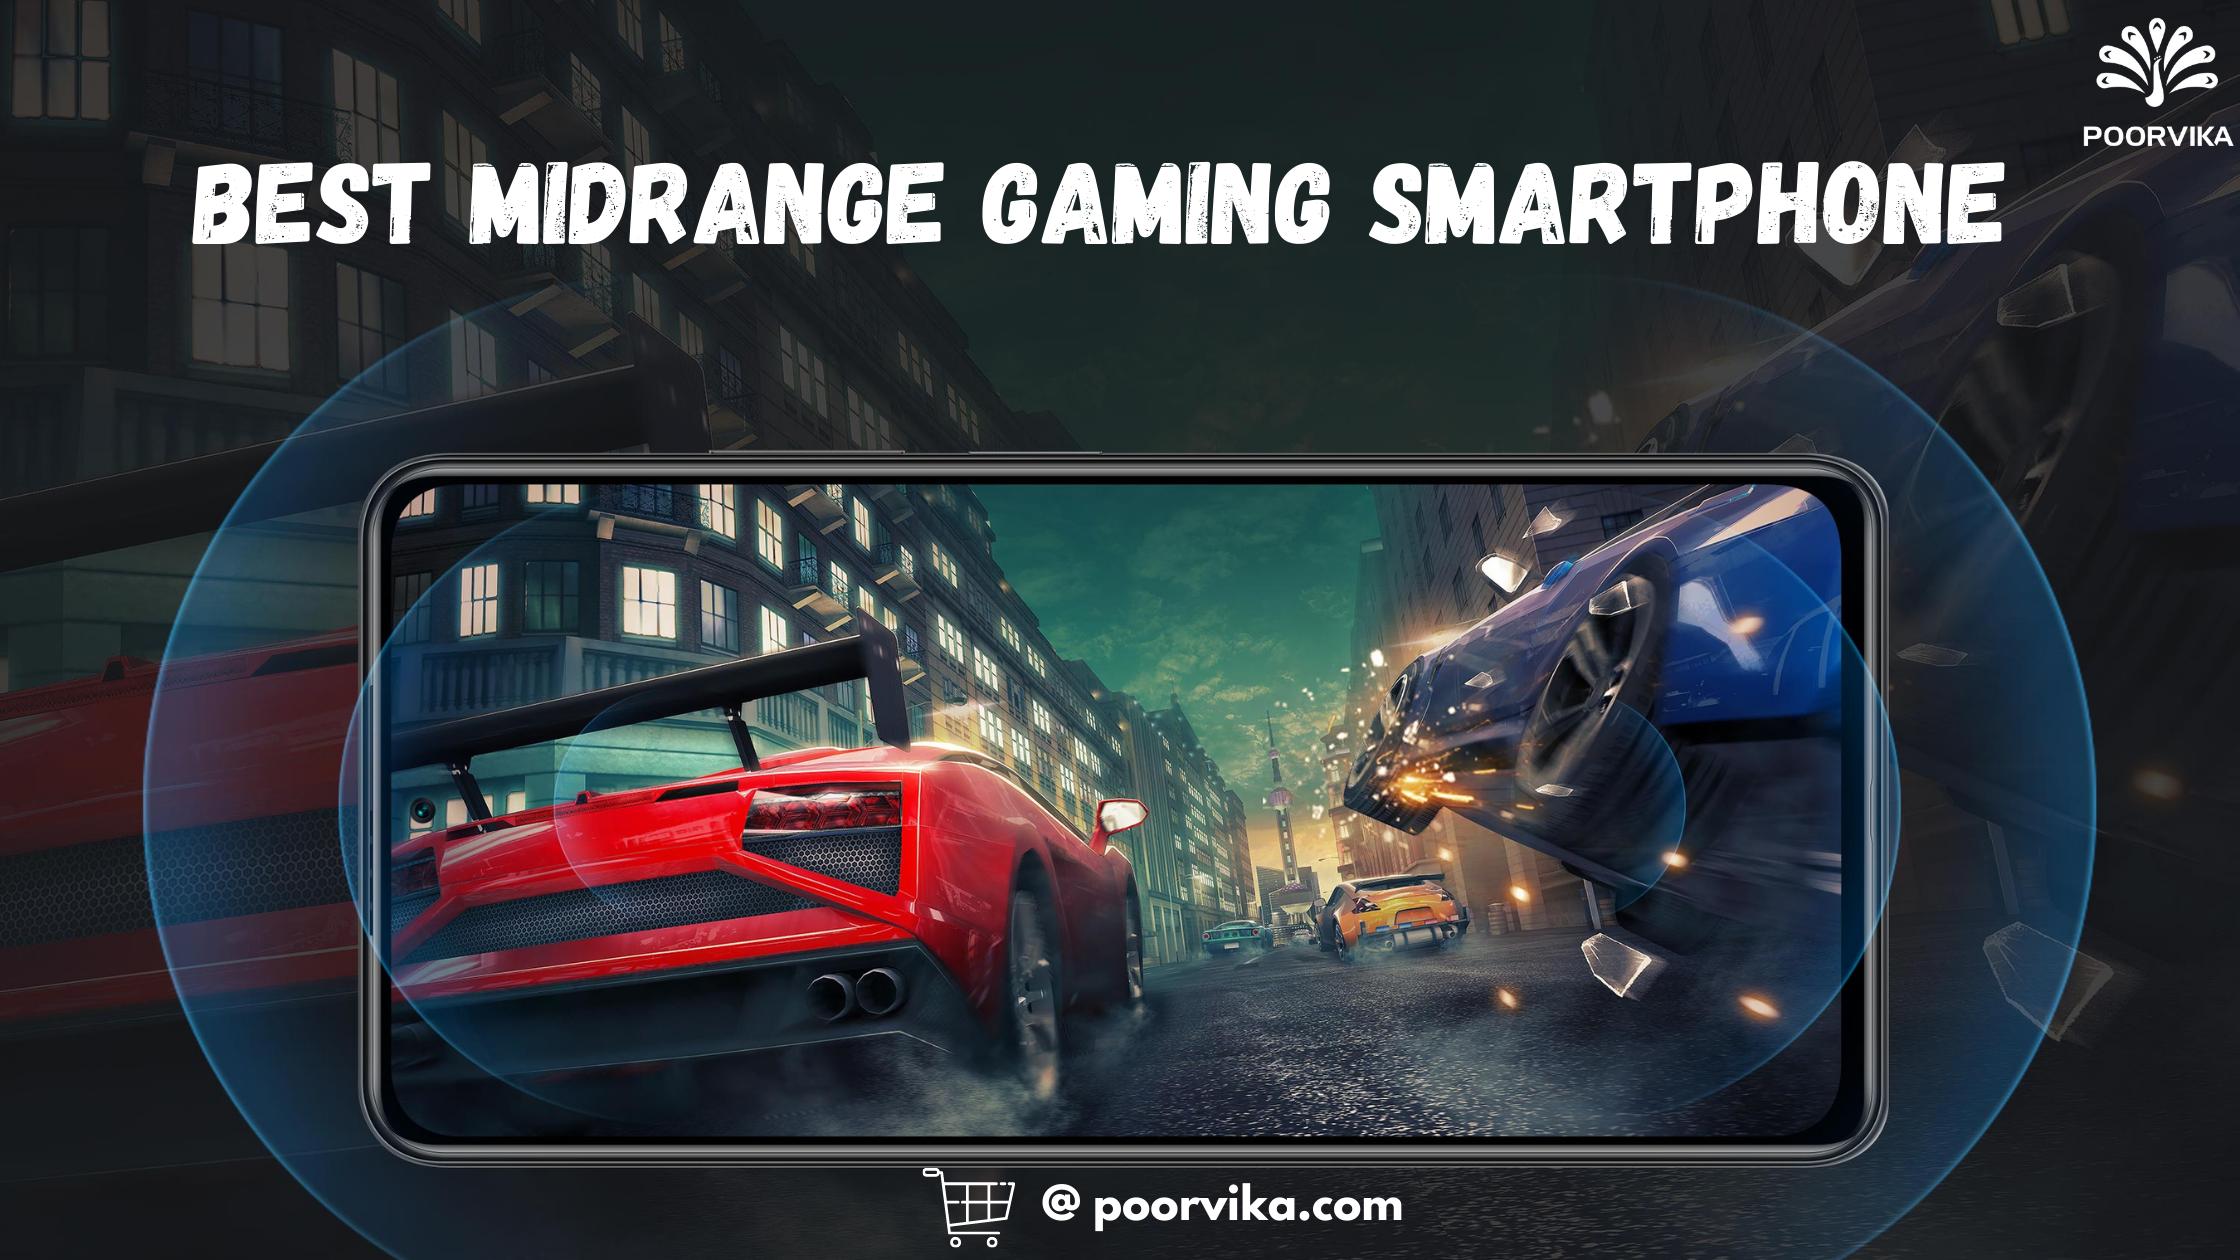 Best Midrange Gaming Smartphone